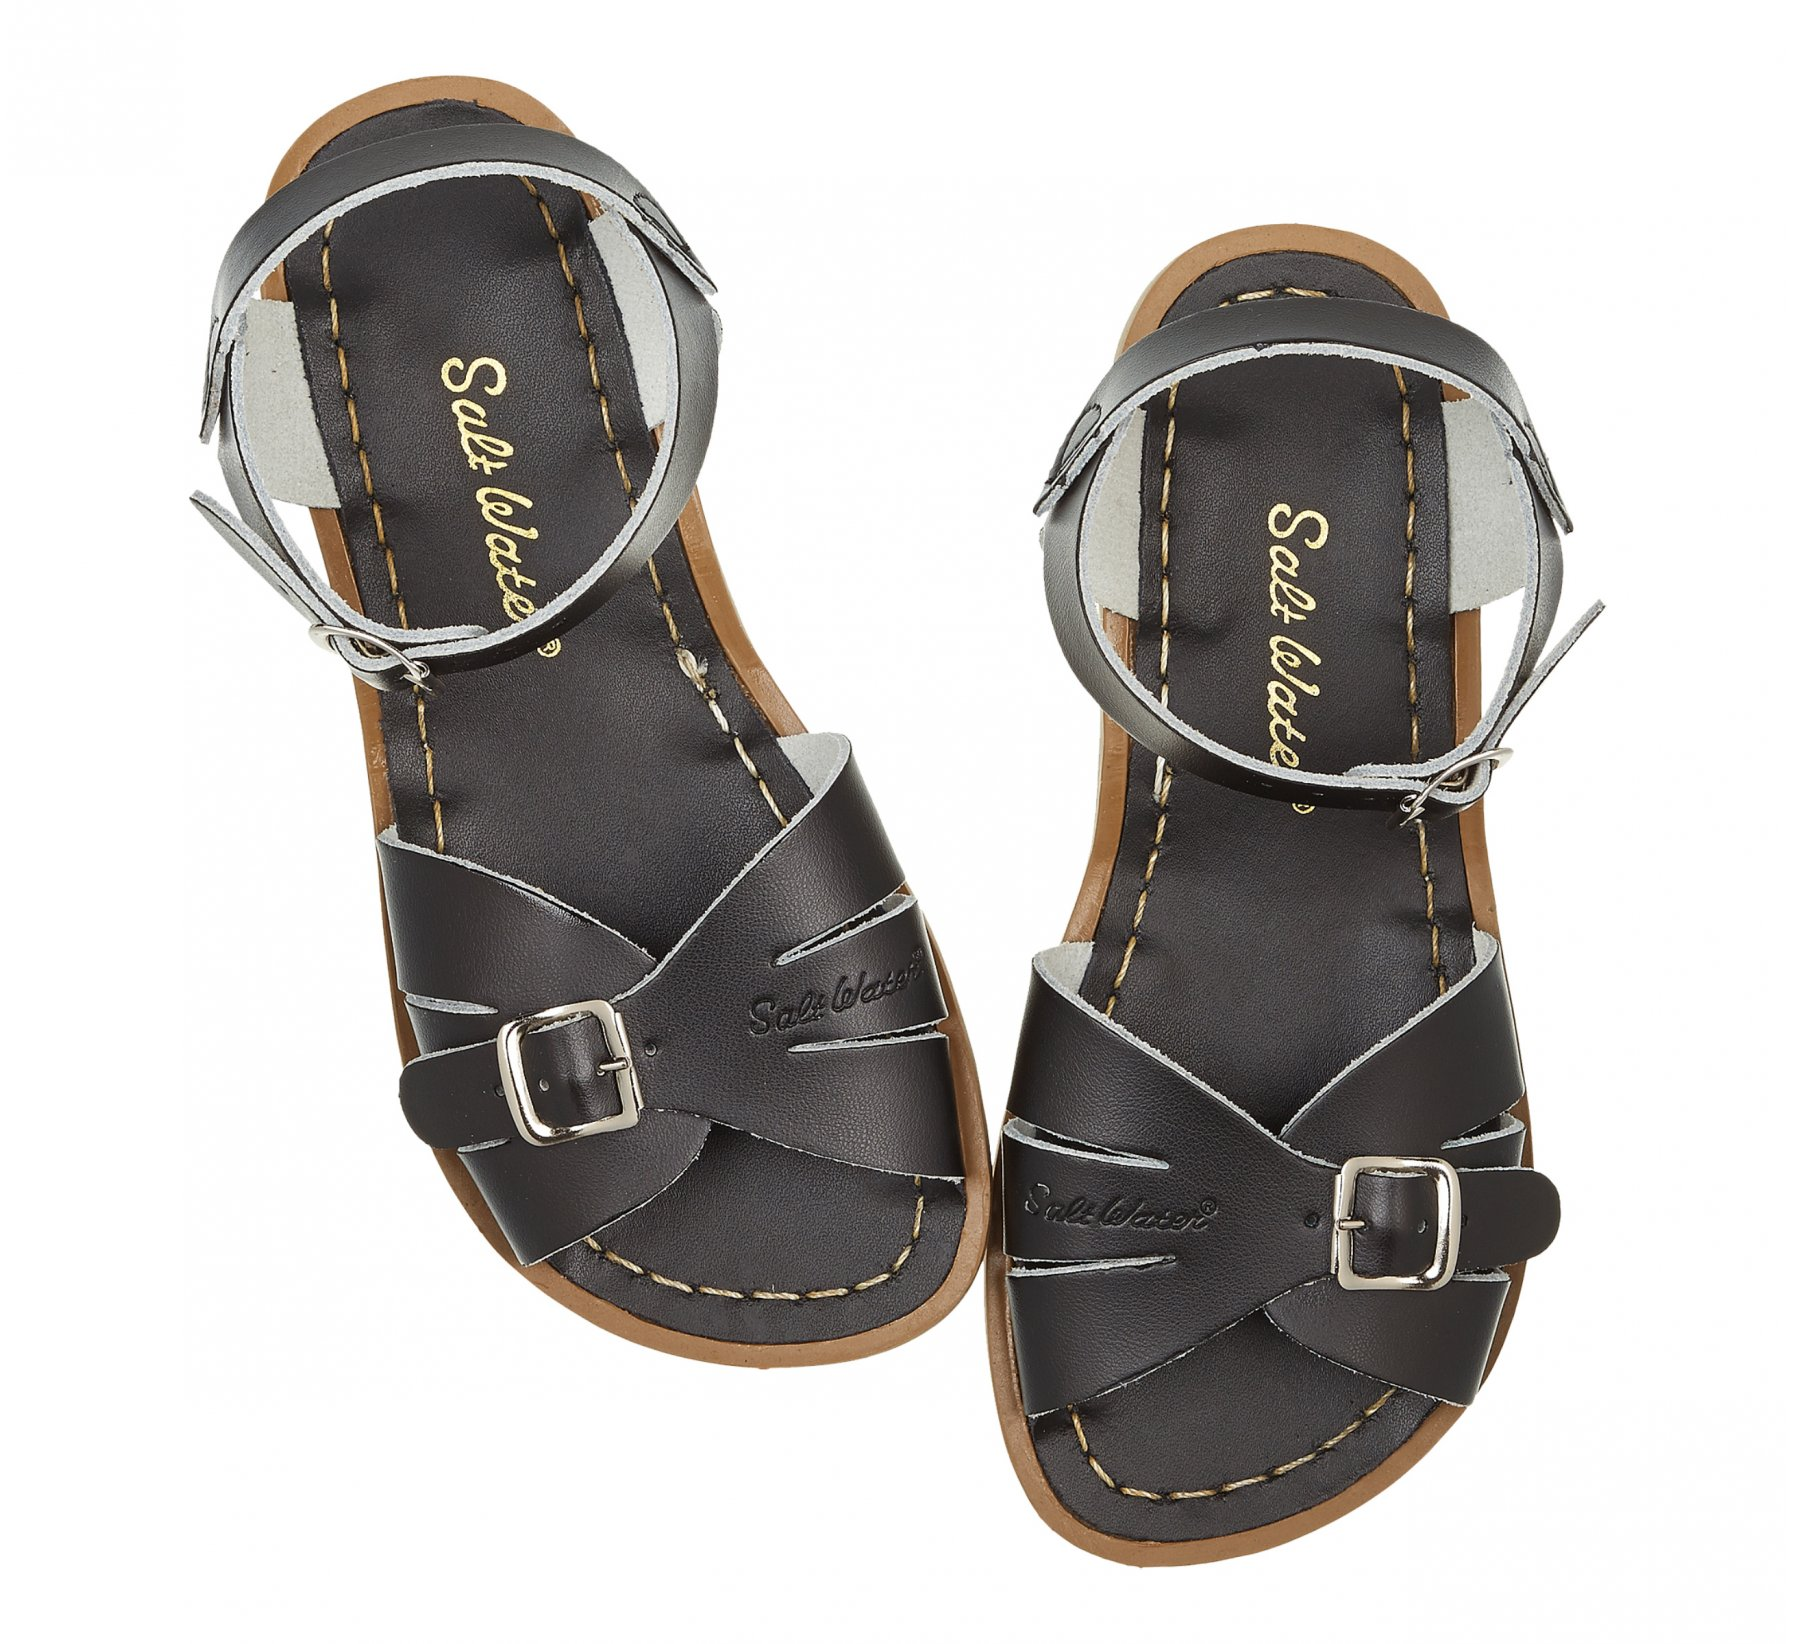 Classic Noir - Salt Water Sandals